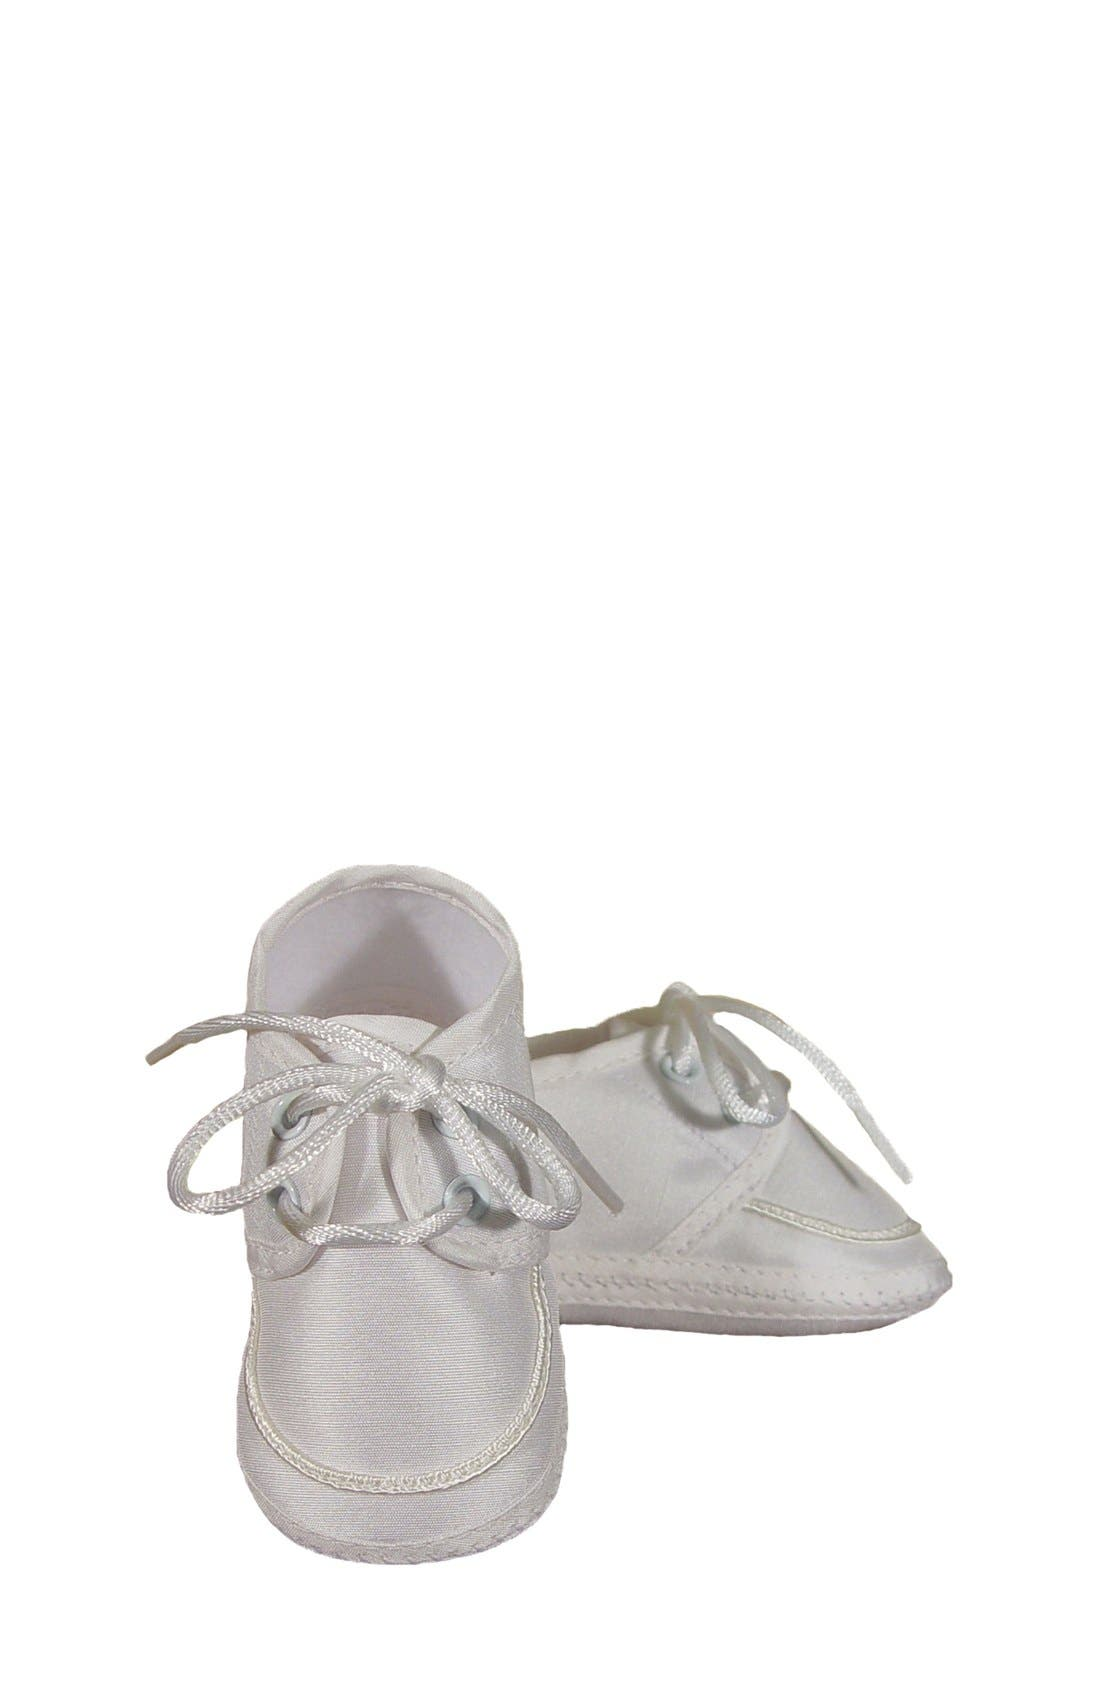 Little Things Mean a Lot Silk Shoe (Baby)